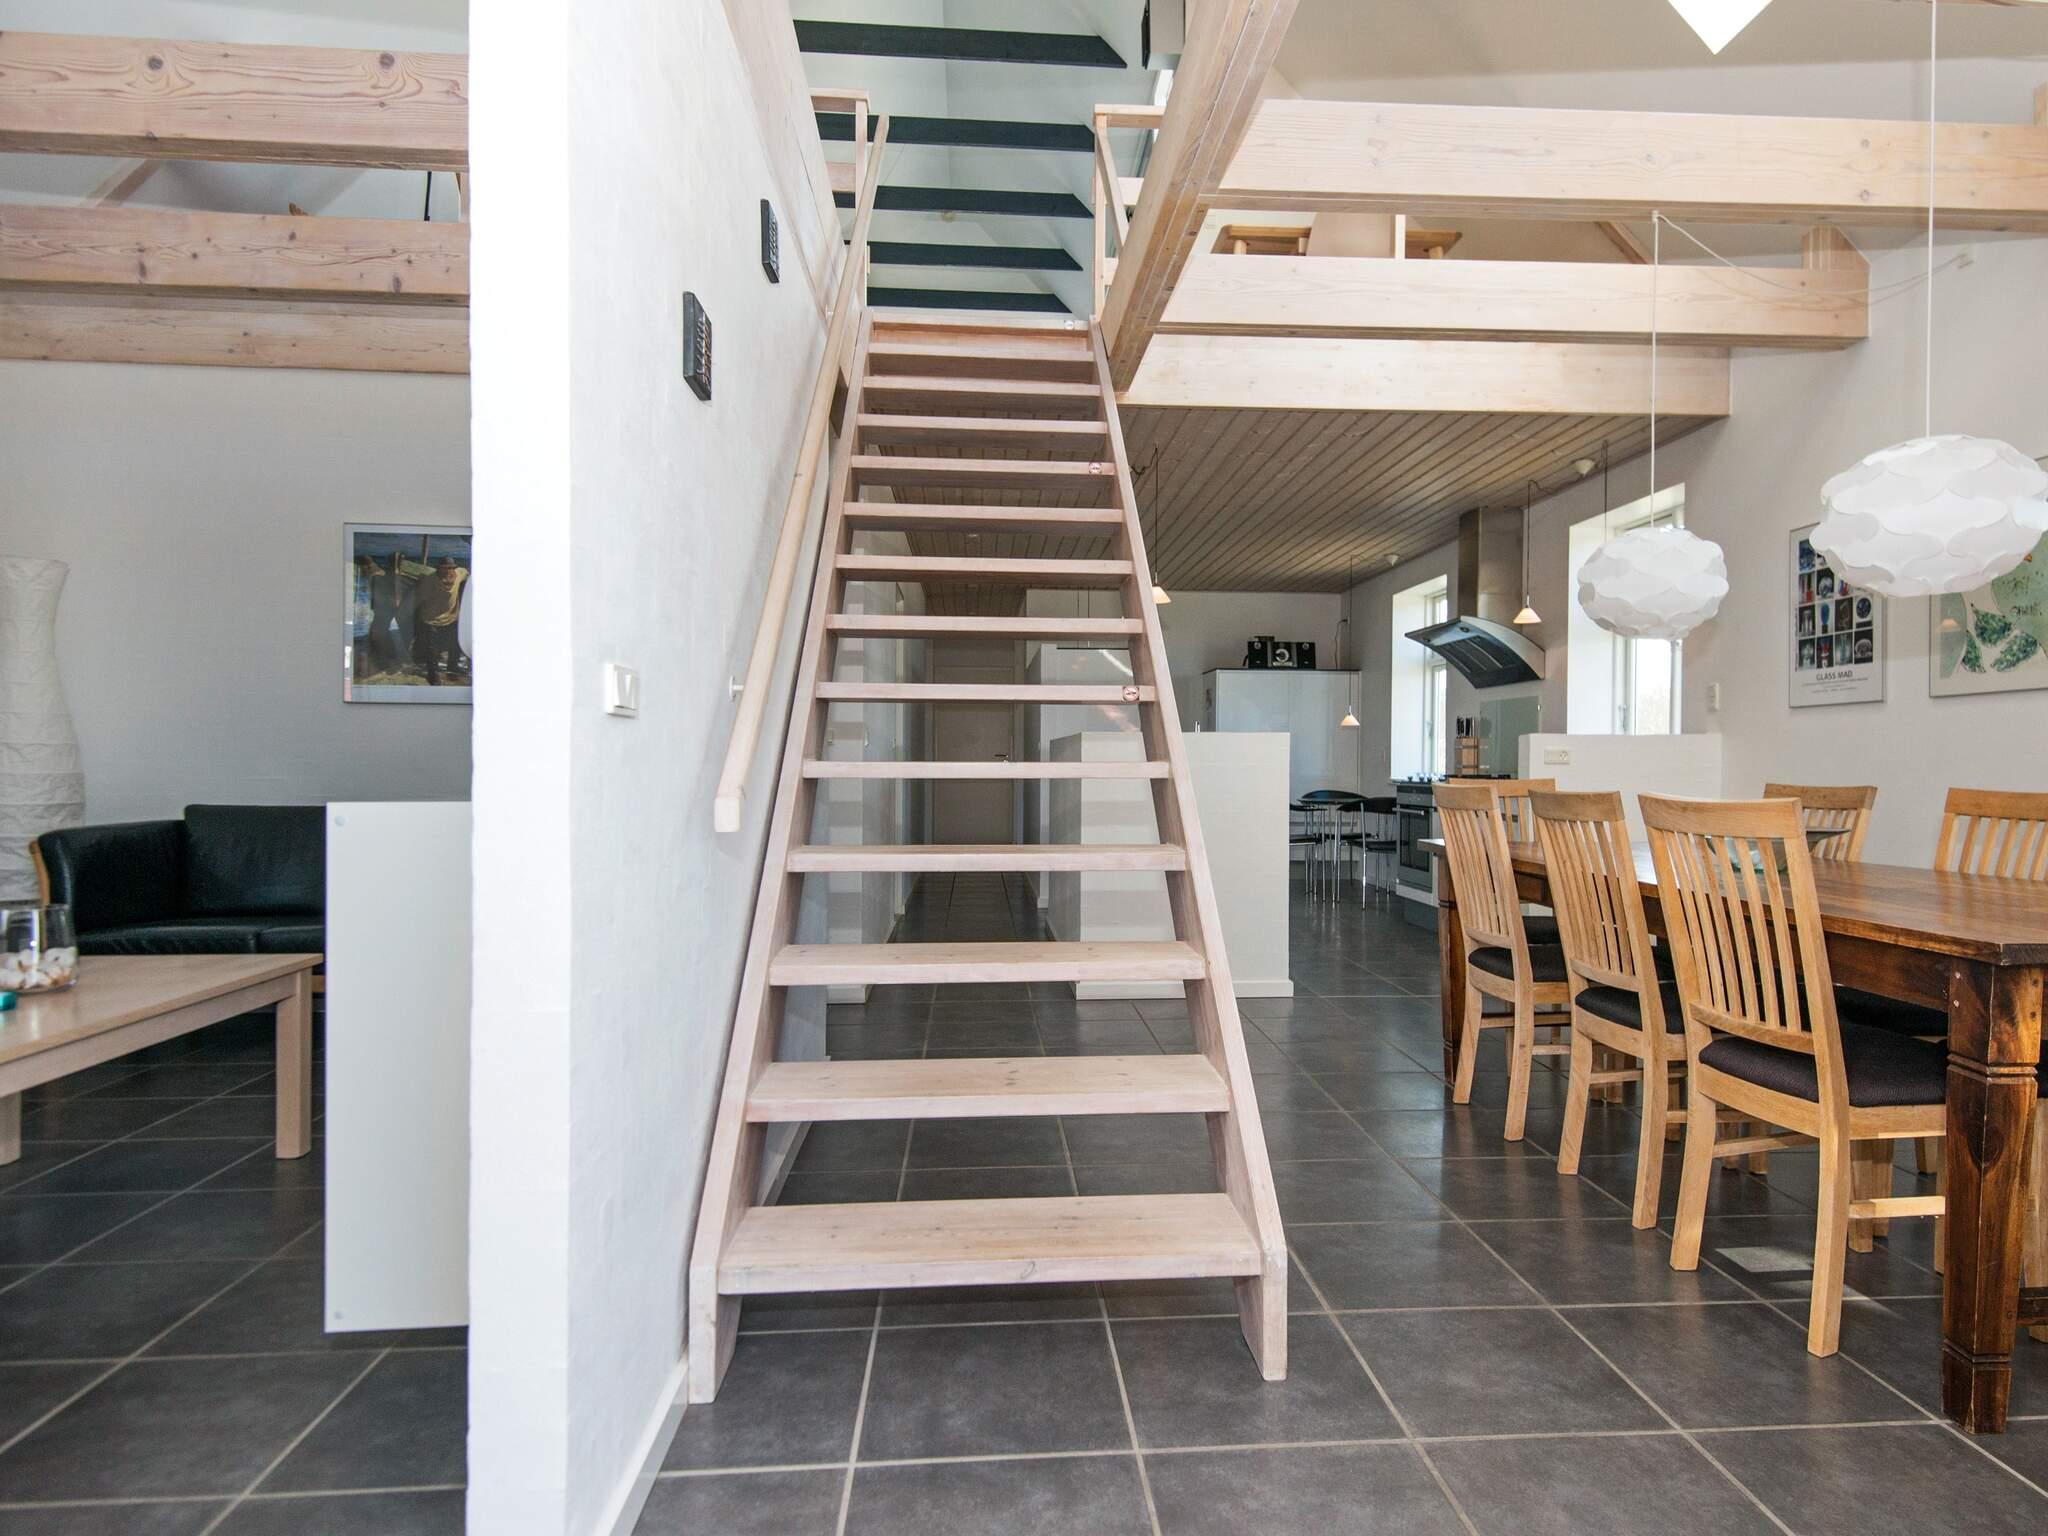 Maison de vacances Helgenæs (590964), Knebel, , Mer Baltique danoise, Danemark, image 6